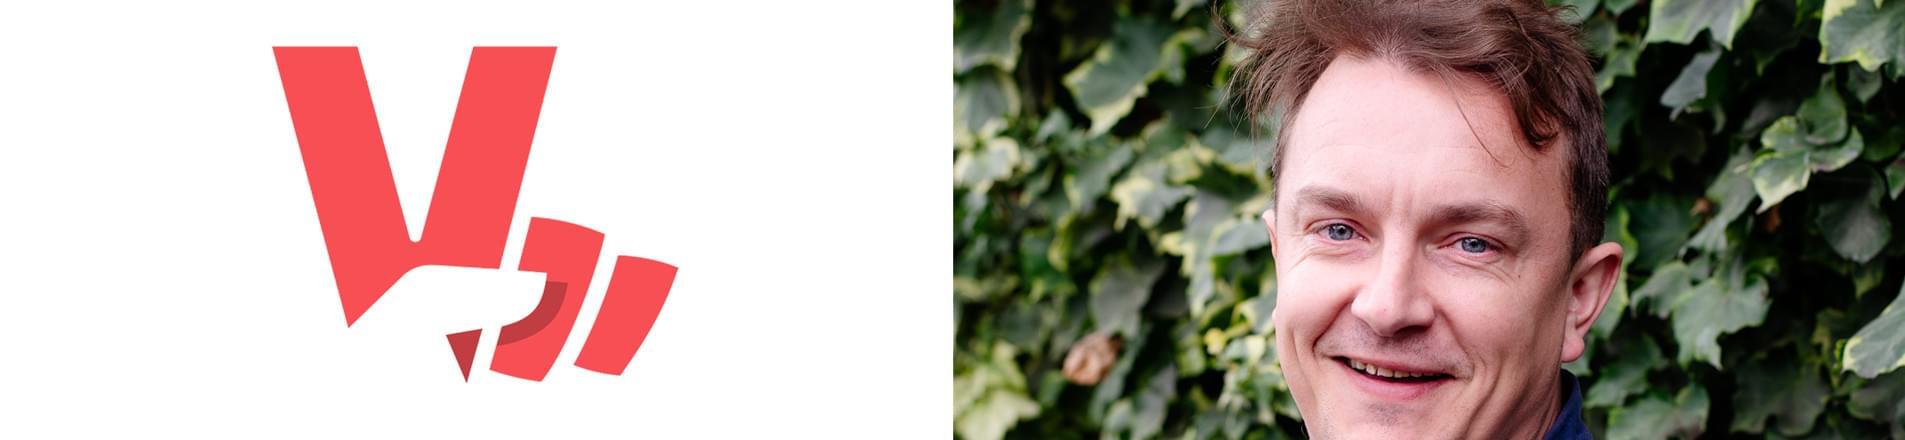 Neurodiversity with VERCIDA: Ben Chalcraft's Story - ADHD, OCD, Dyslexia